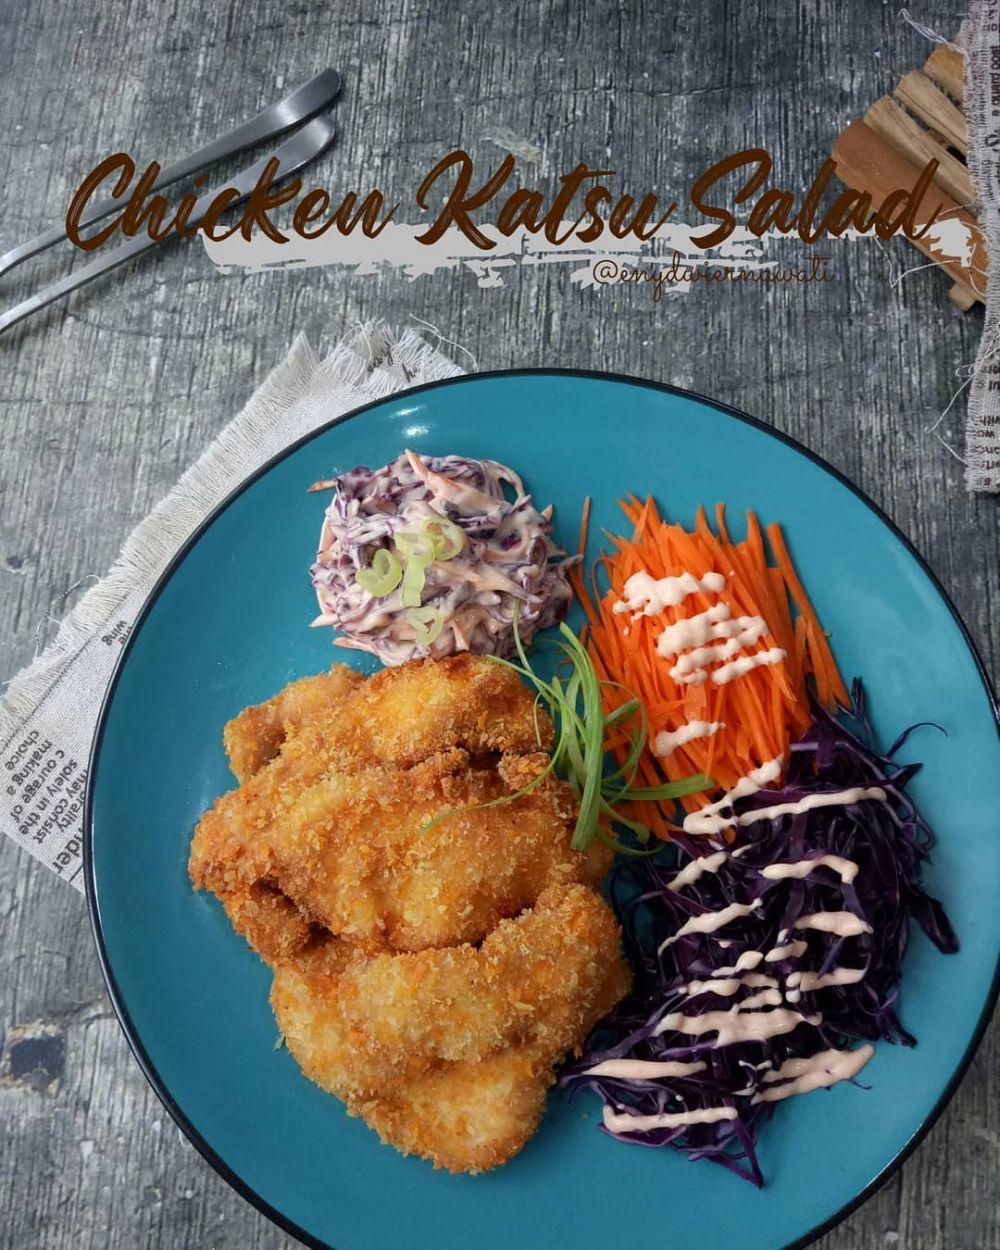 Resep ayam katsu mudah dan enak untuk menu buka puasa © berbagai sumber